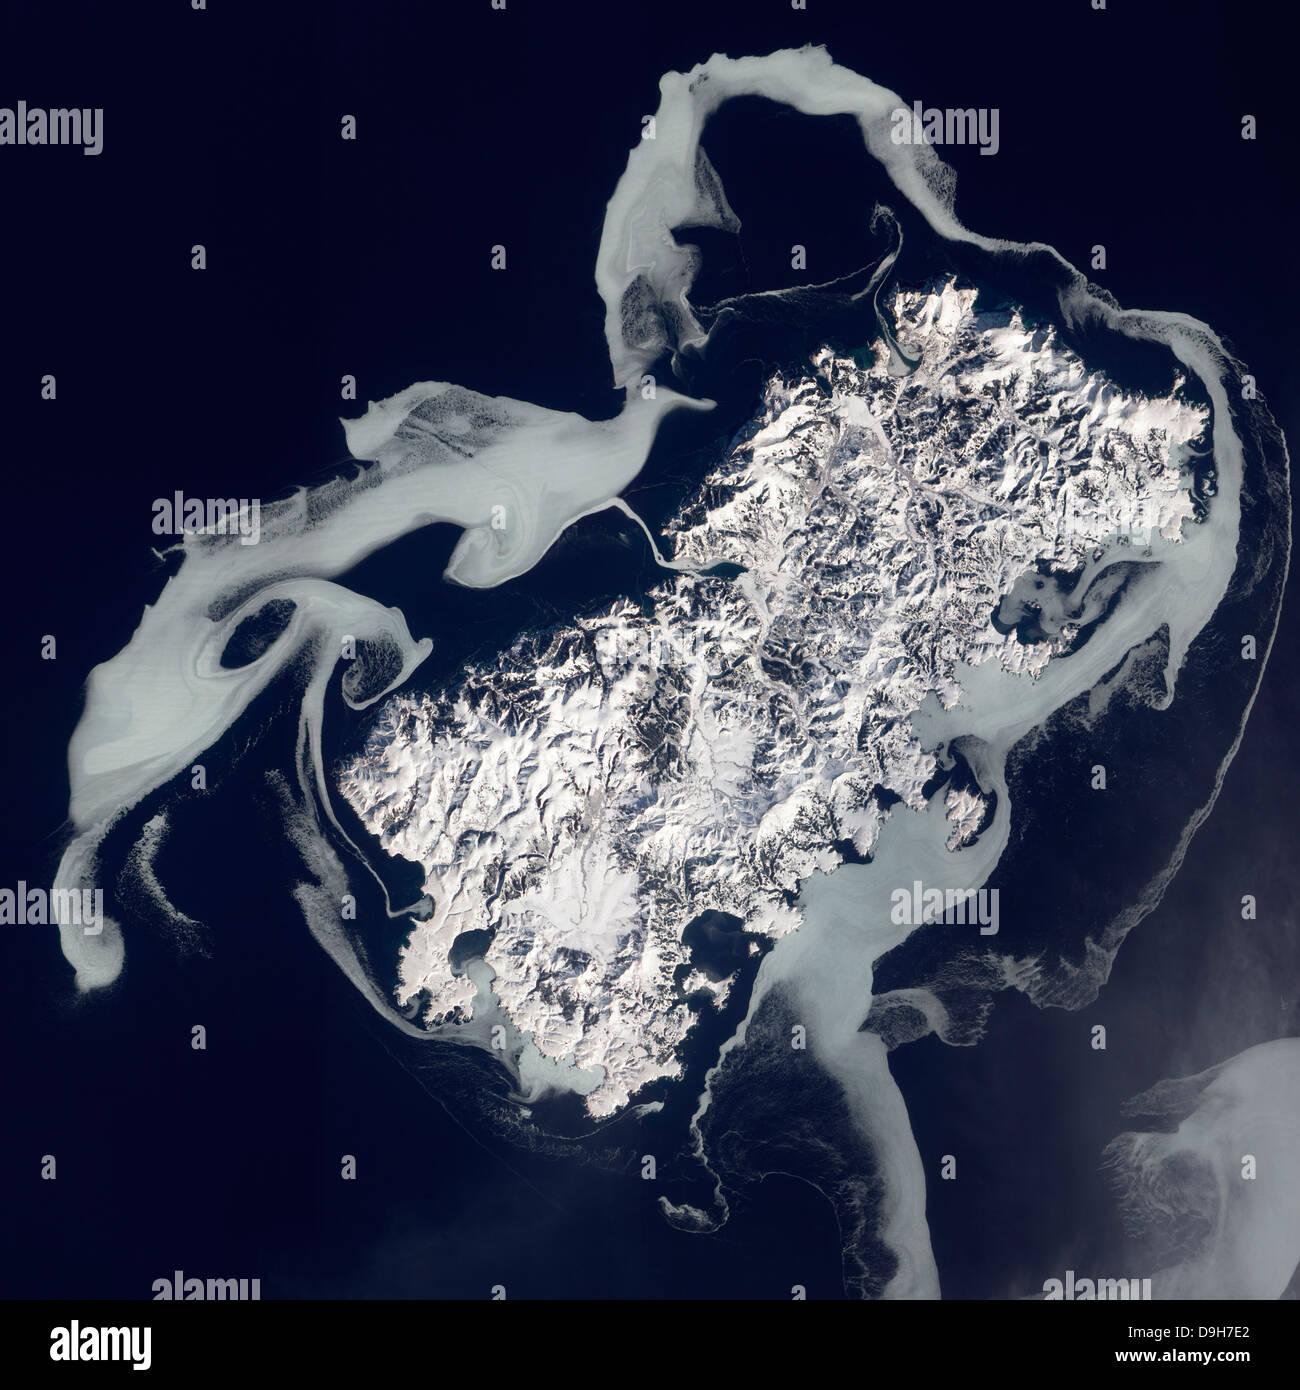 Sea ice surrounds the volcanic island of Shikotan. - Stock Image